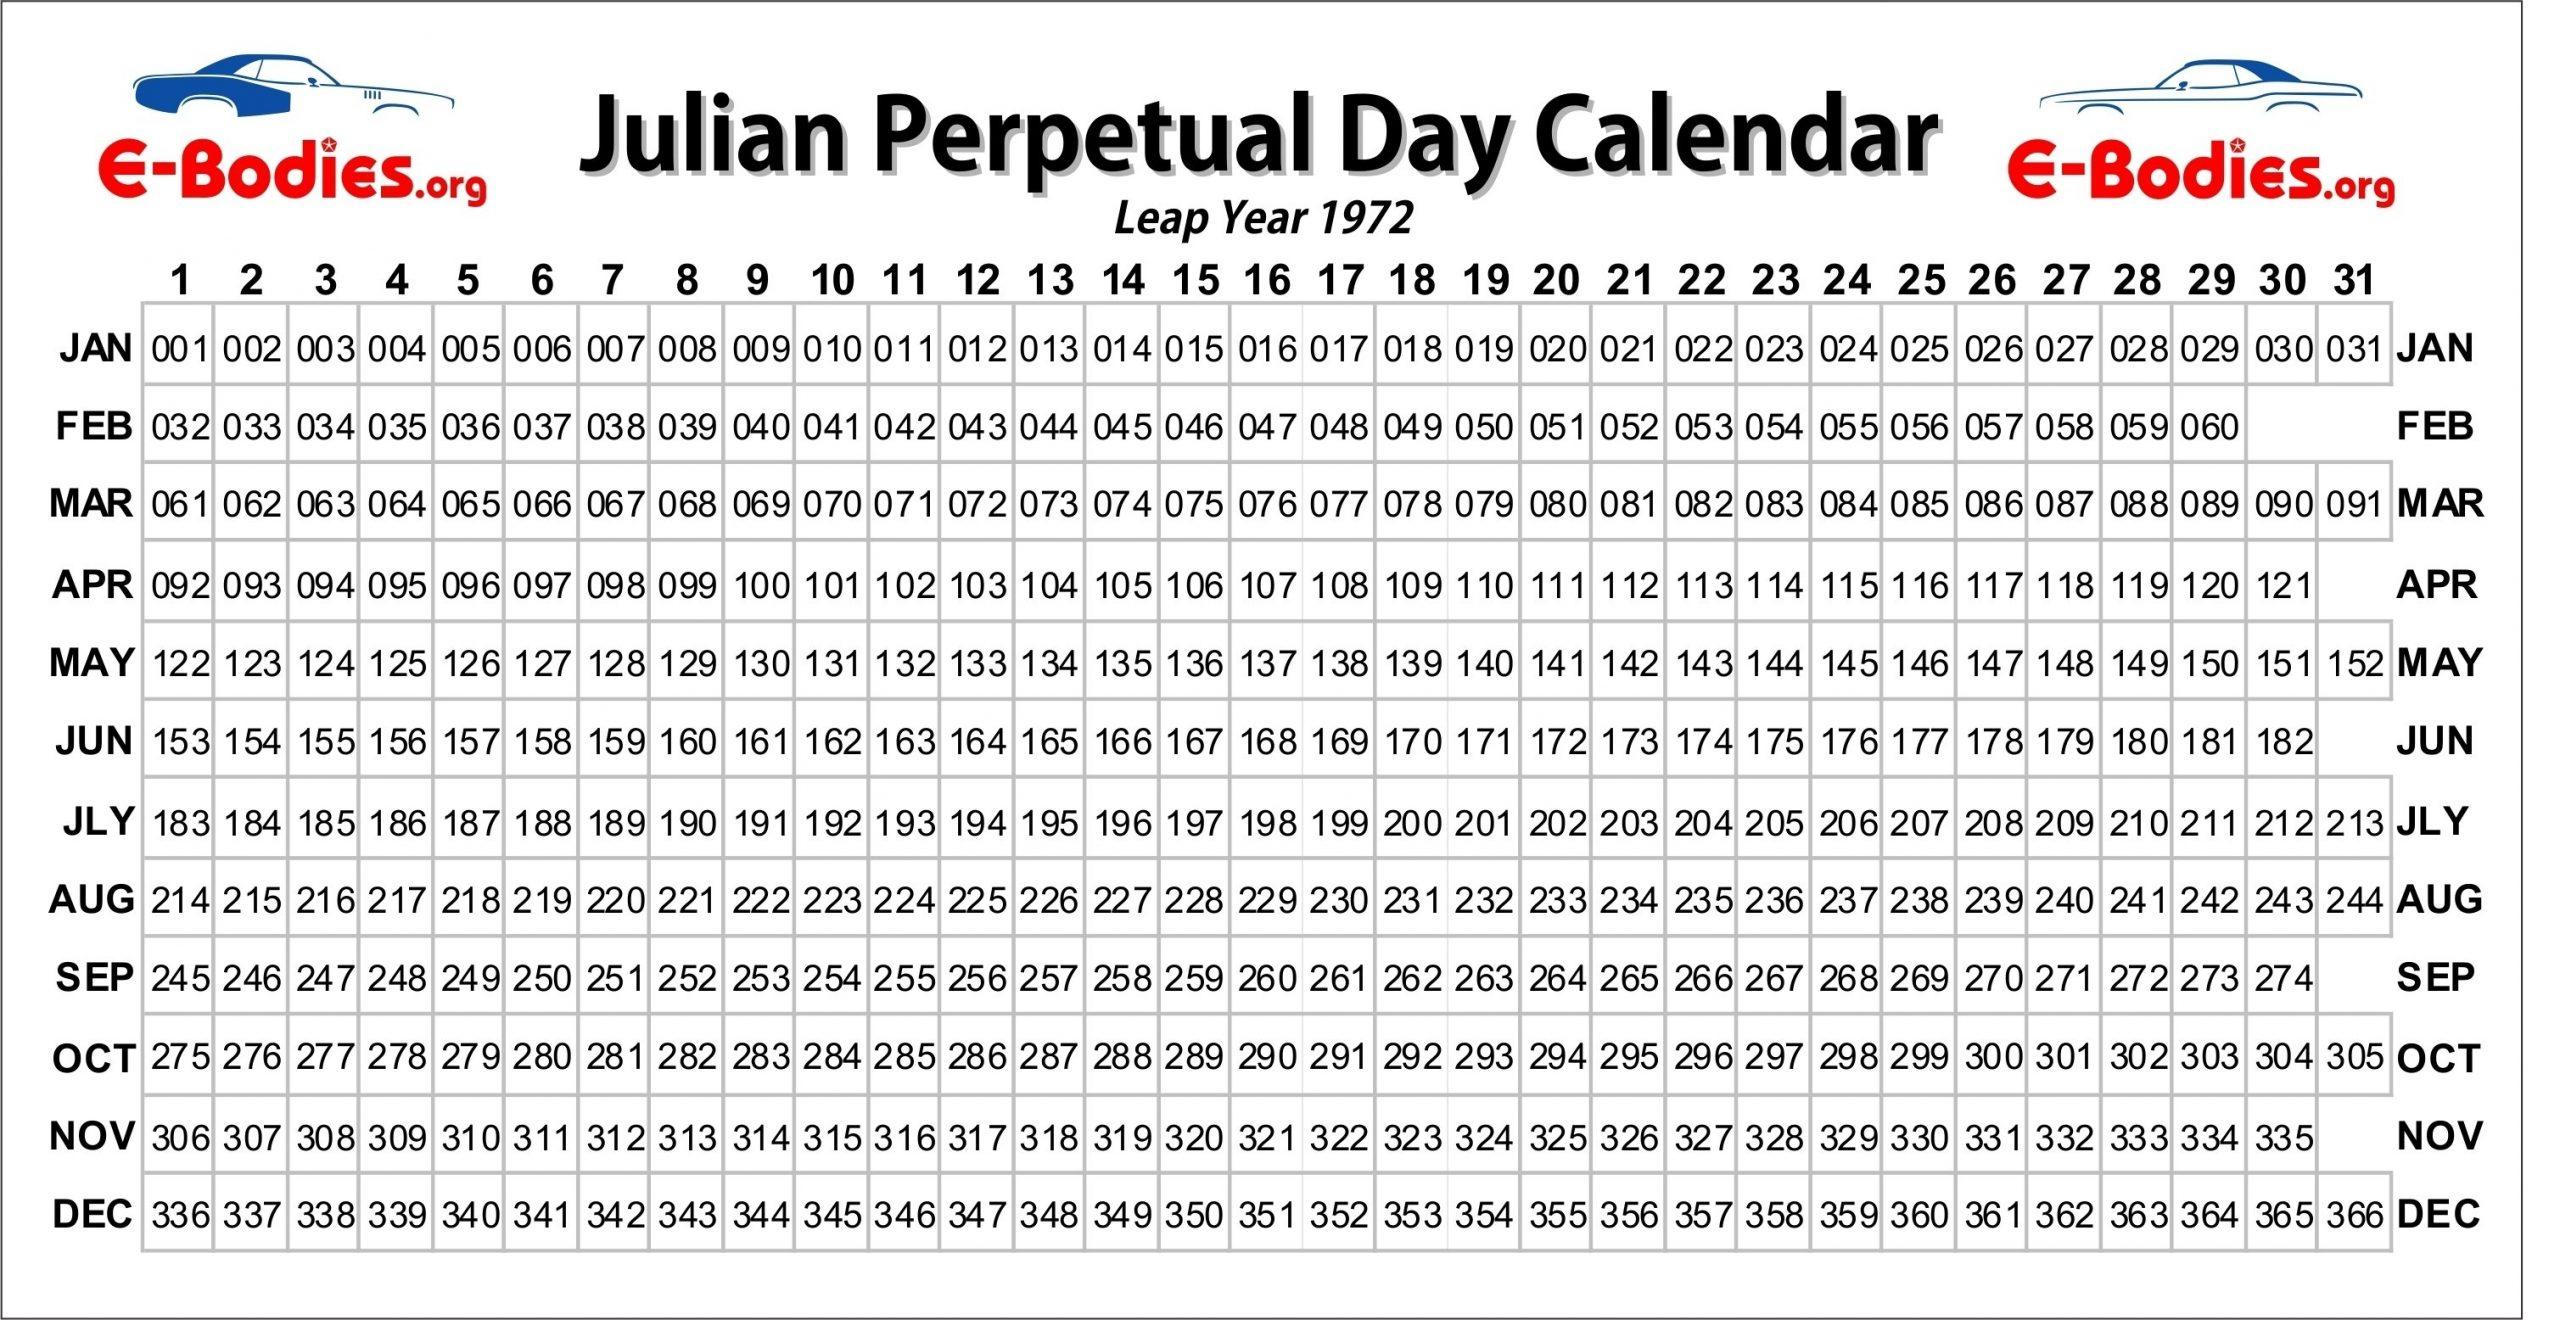 Julian Date For Leap Year - Calendar Inspiration Design with regard to Juoian Date Calender Leap Yeat Photo